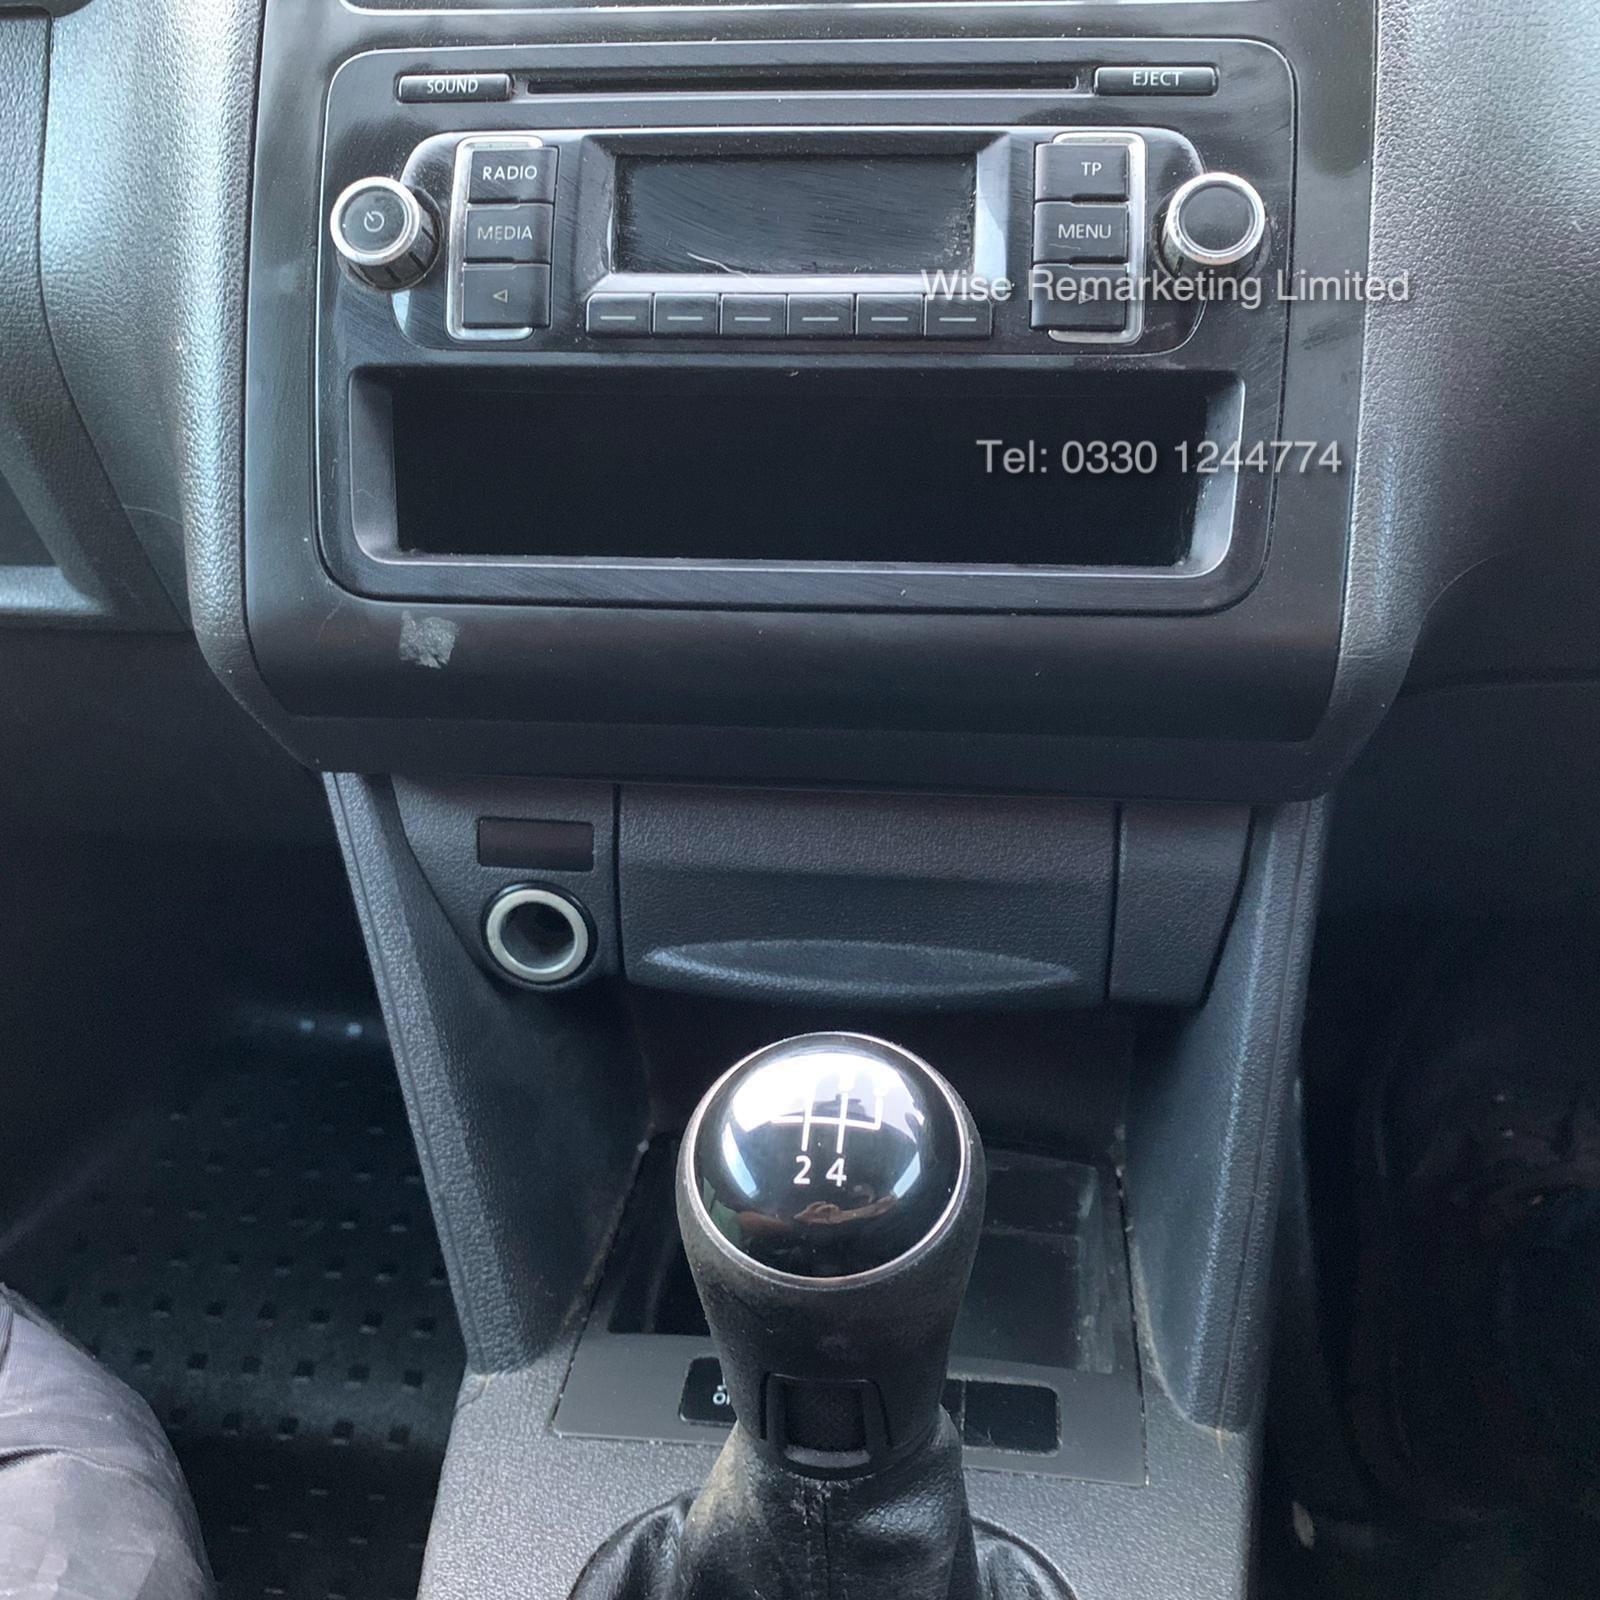 Volkswagen Caddy C20 1.6 TDI - 2013 13 Reg - Silver - Side Loading Door - Ply Lined - Image 17 of 18